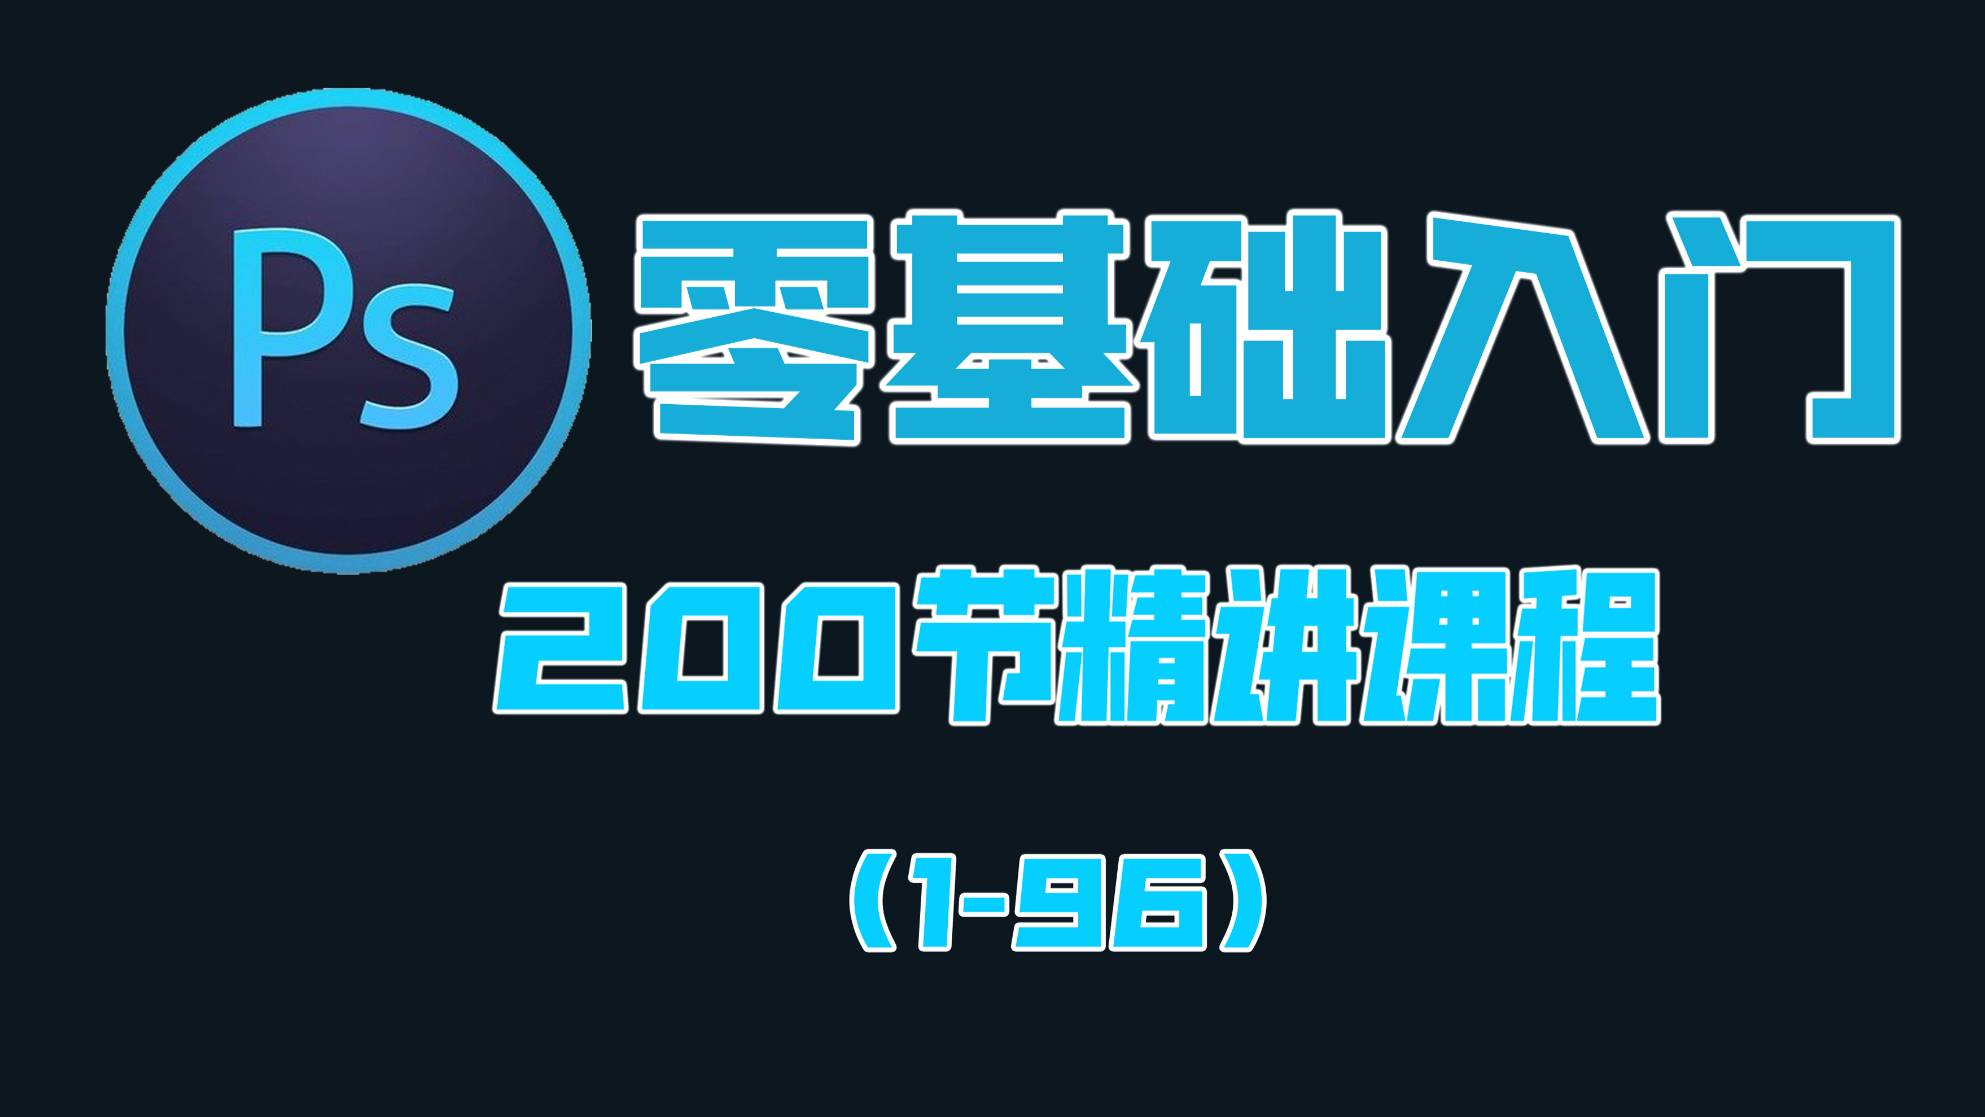 【PS 零基础快速入门教程】全集200节超详细ps课程(1-96)